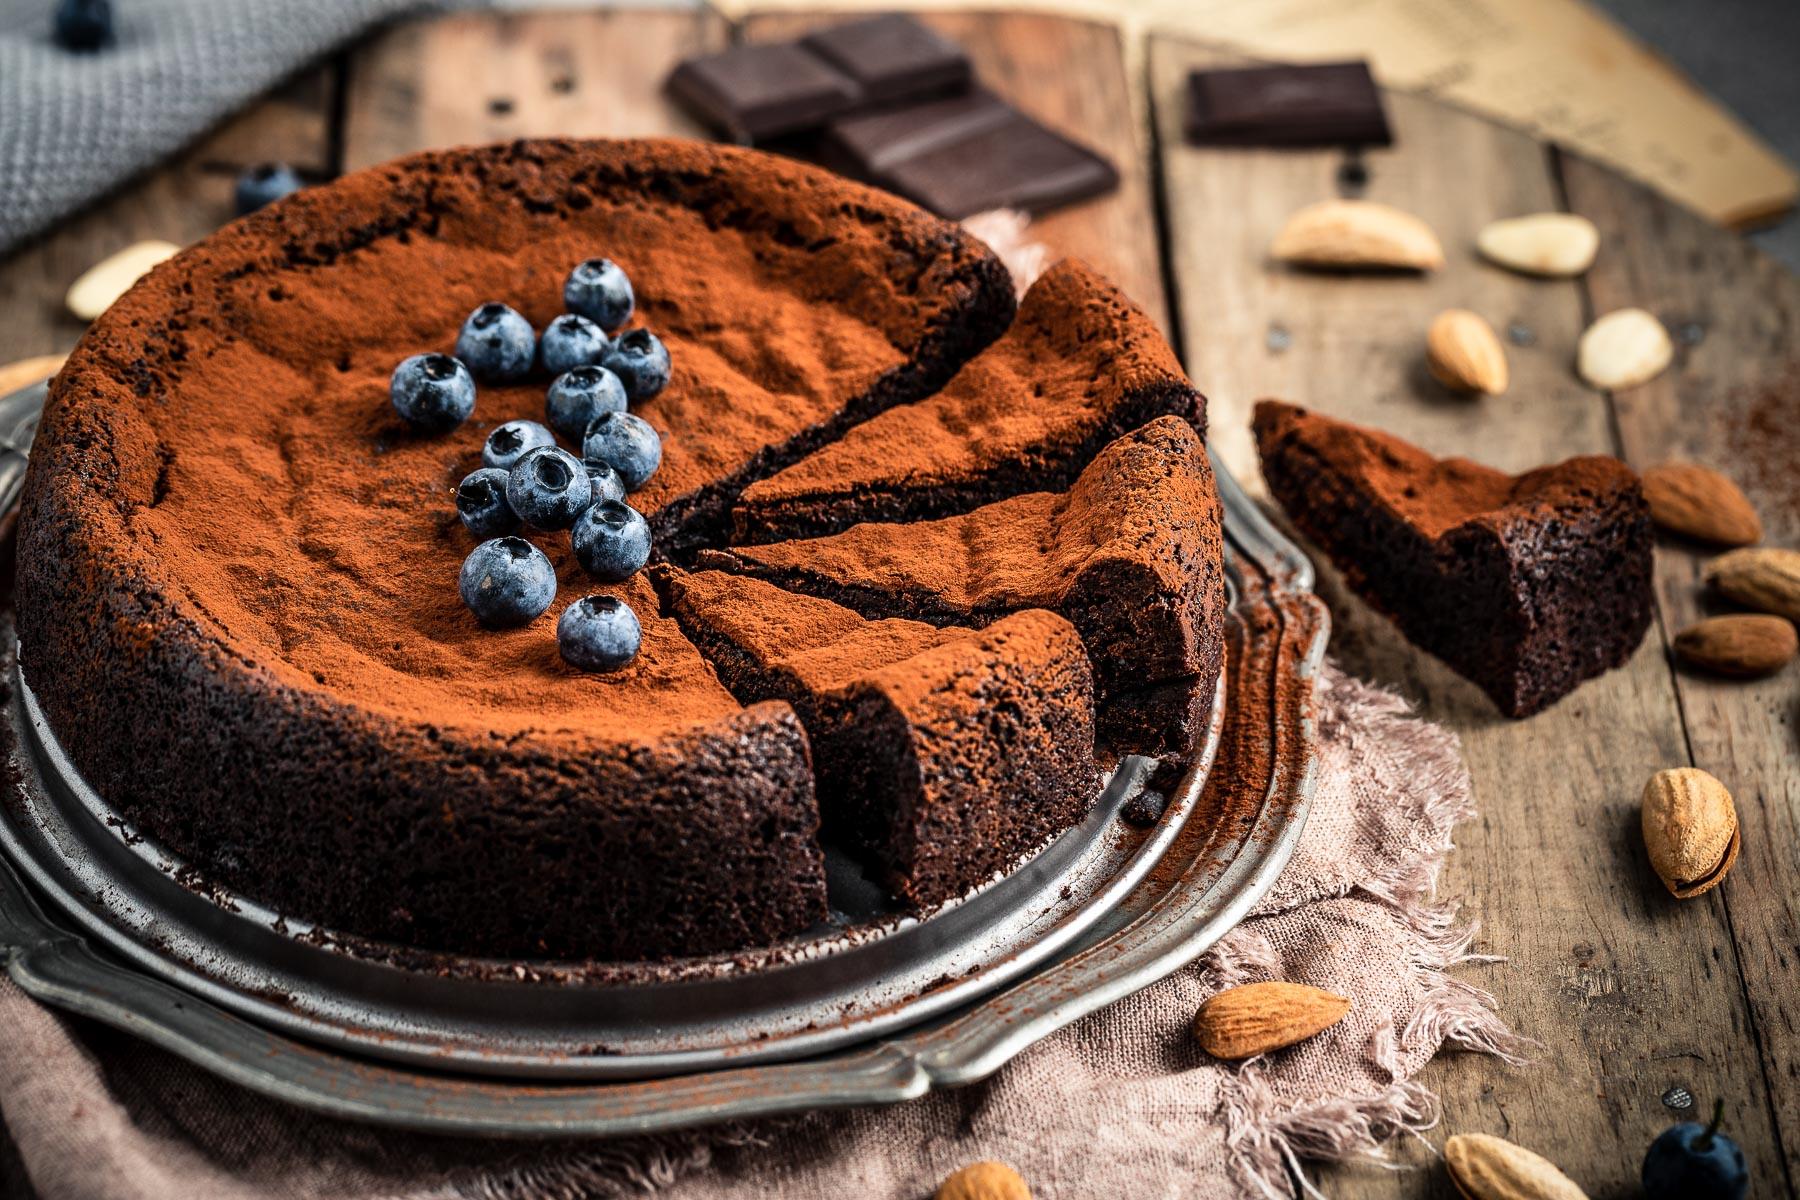 TORTA al CIOCCOLATO e MANDORLE vegan senza glutine senza farina gluten-free paleo FLOURLESS VEGAN CHOCOLATE CAKE recipe